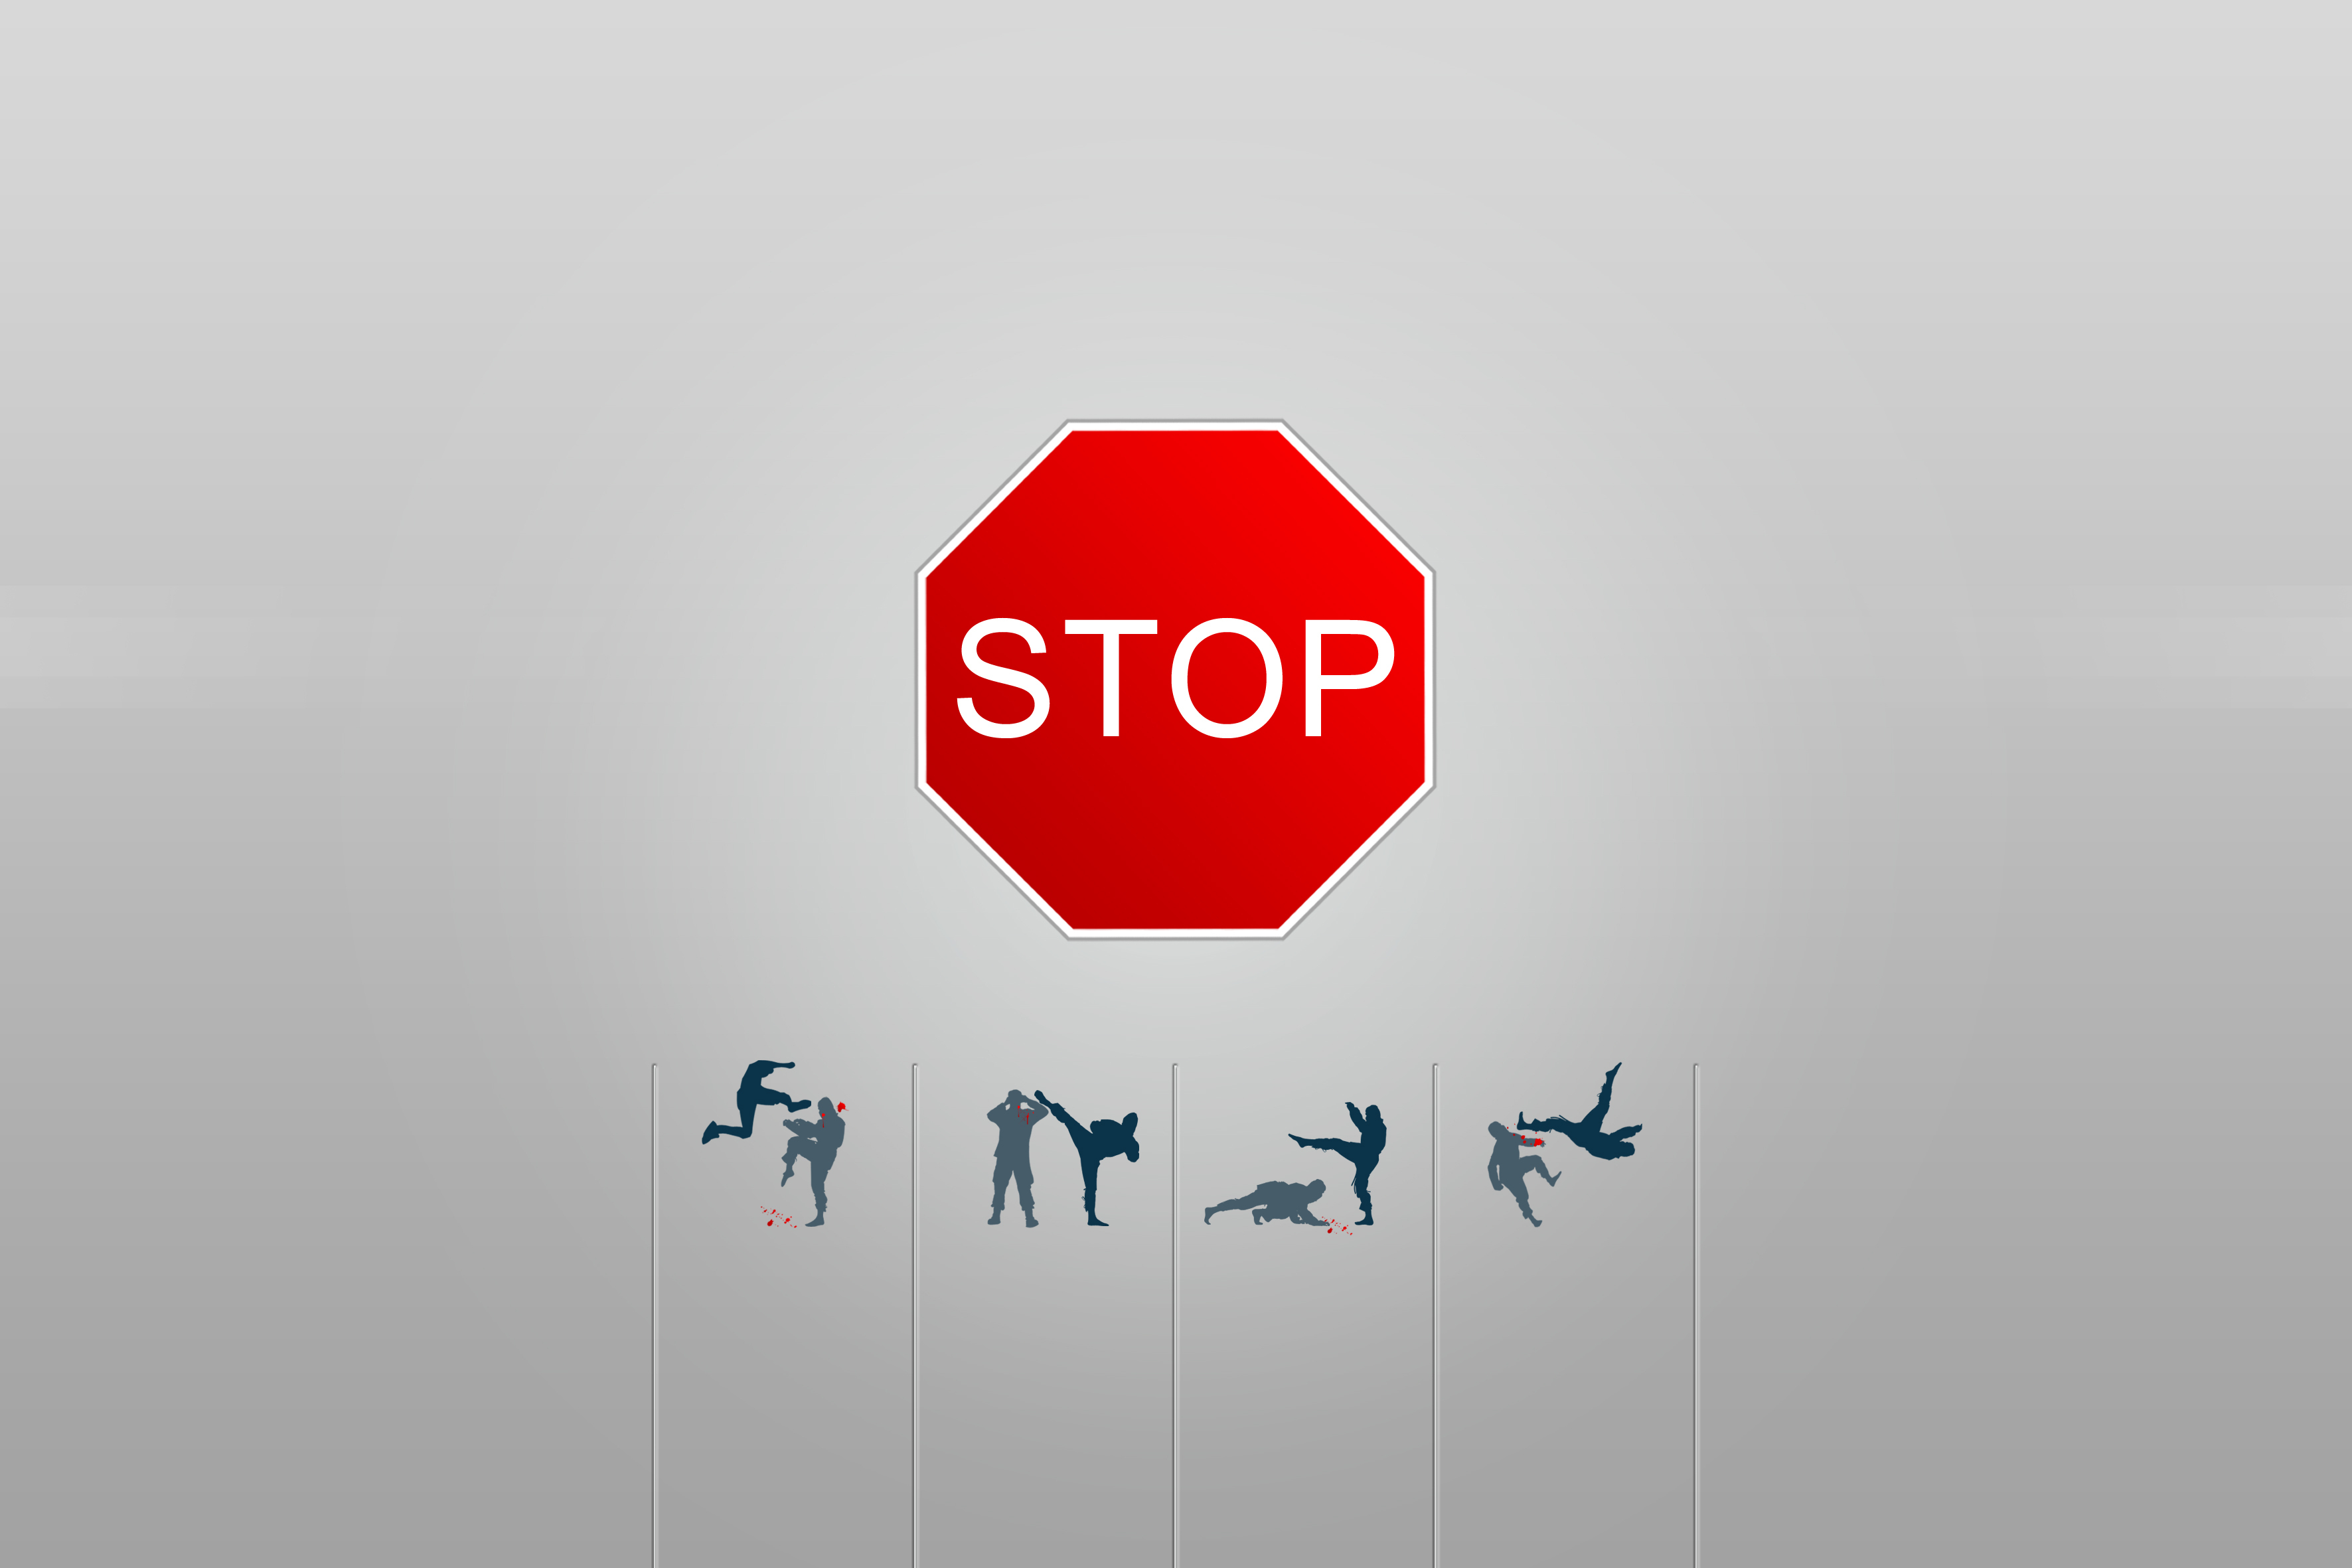 Motivational hd wallpaper background image 3543x2362 - Quit wallpaper ...